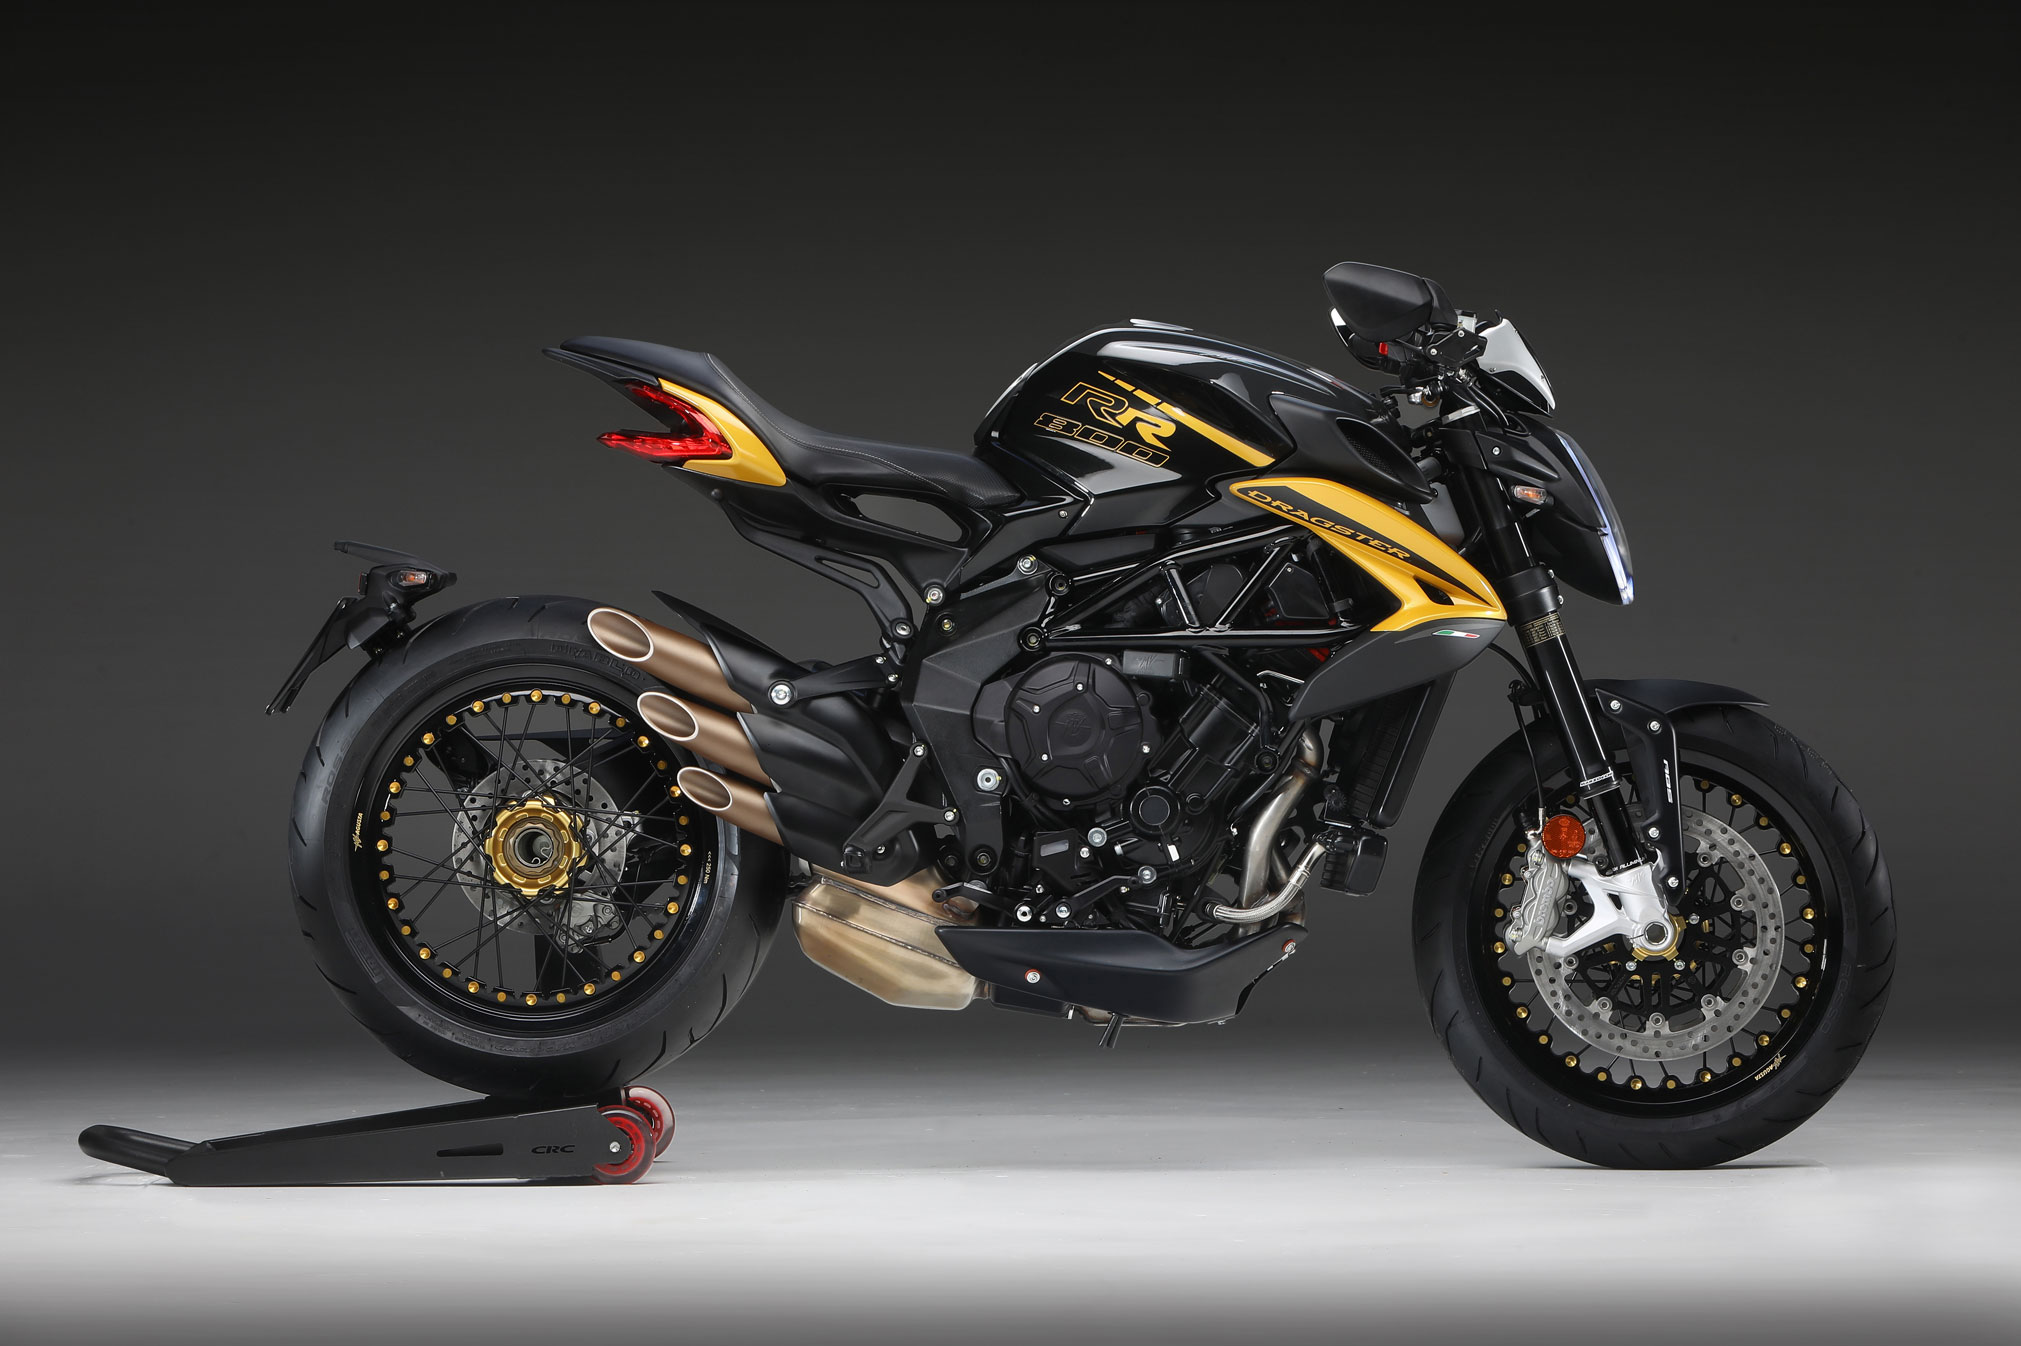 2021 MV Agusta Brutale 1000RR Guide • Total Motorcycle